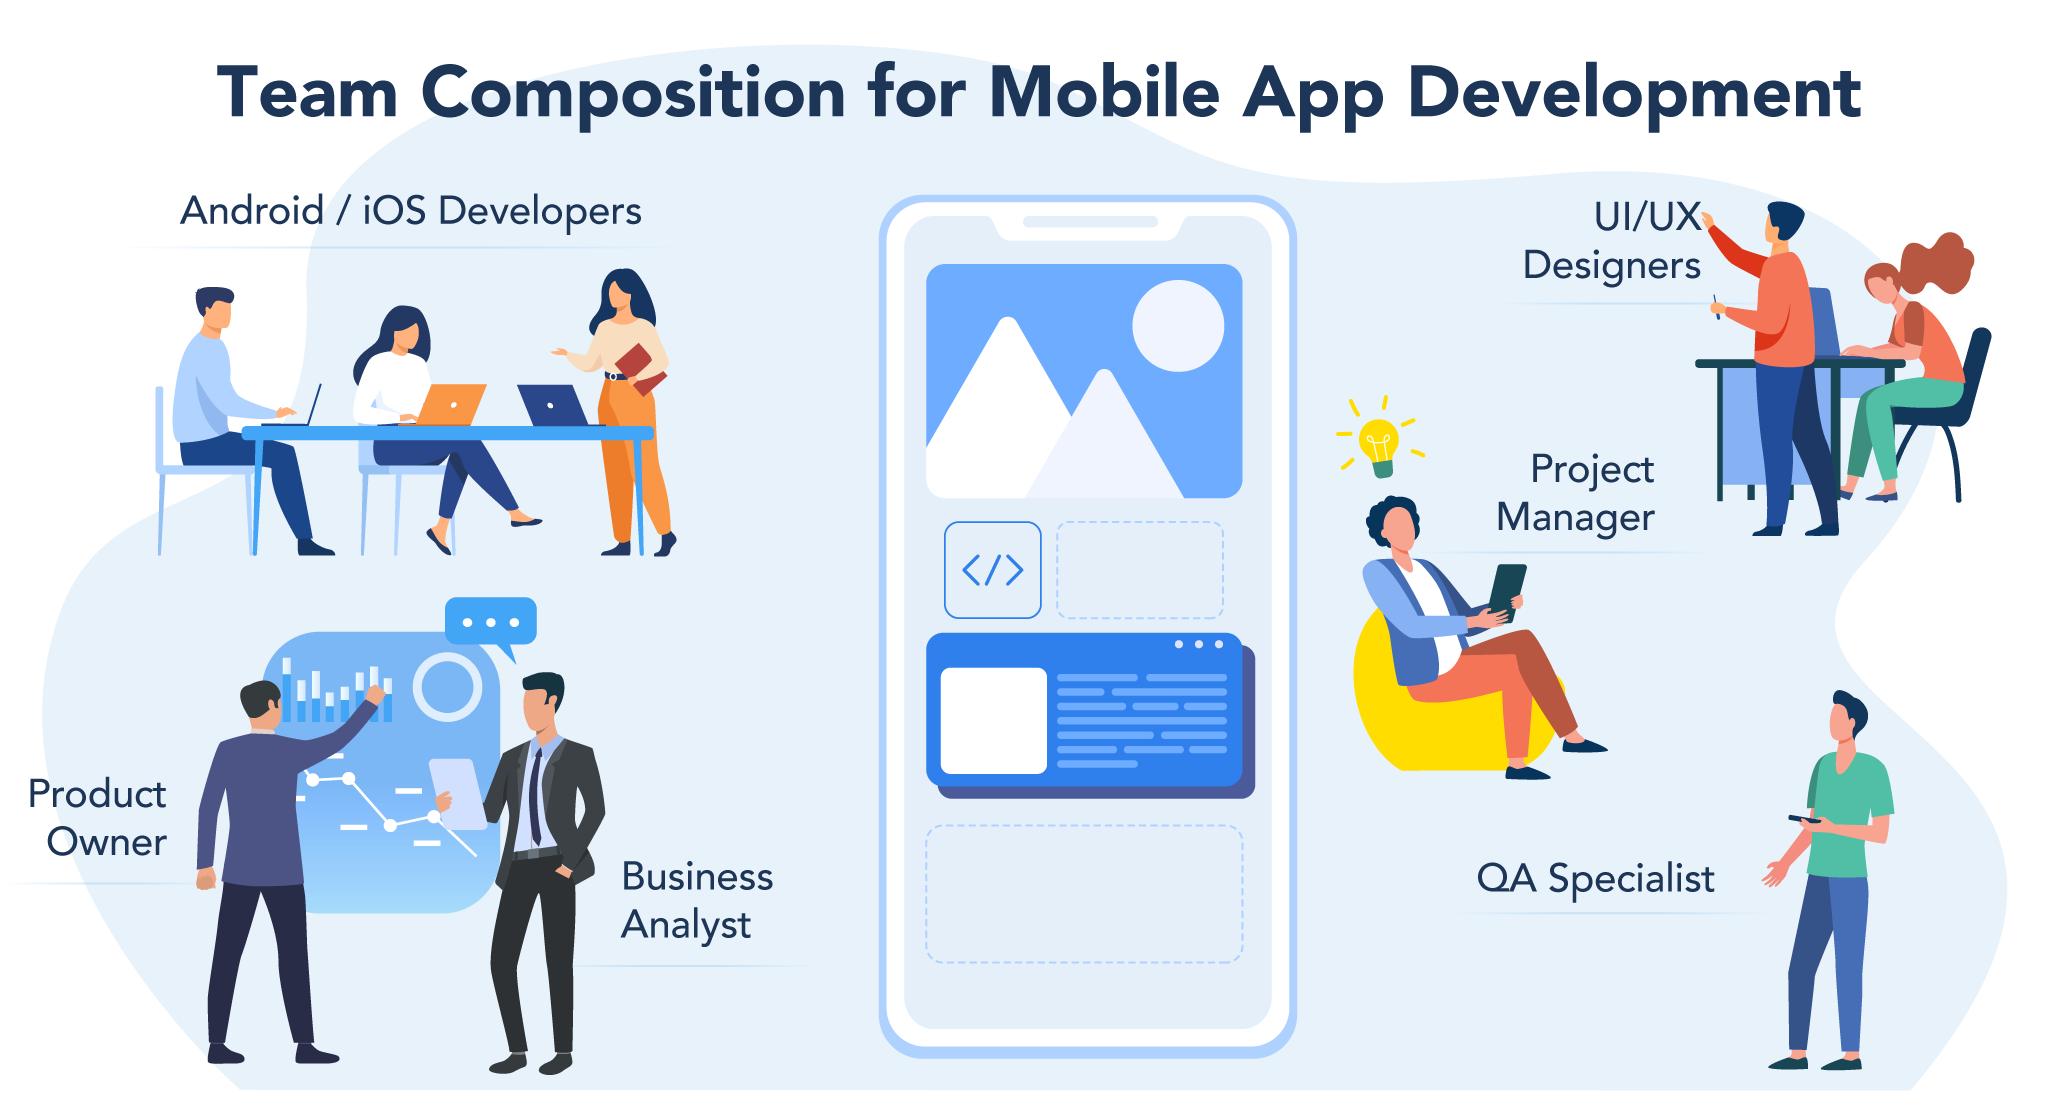 Development team composition